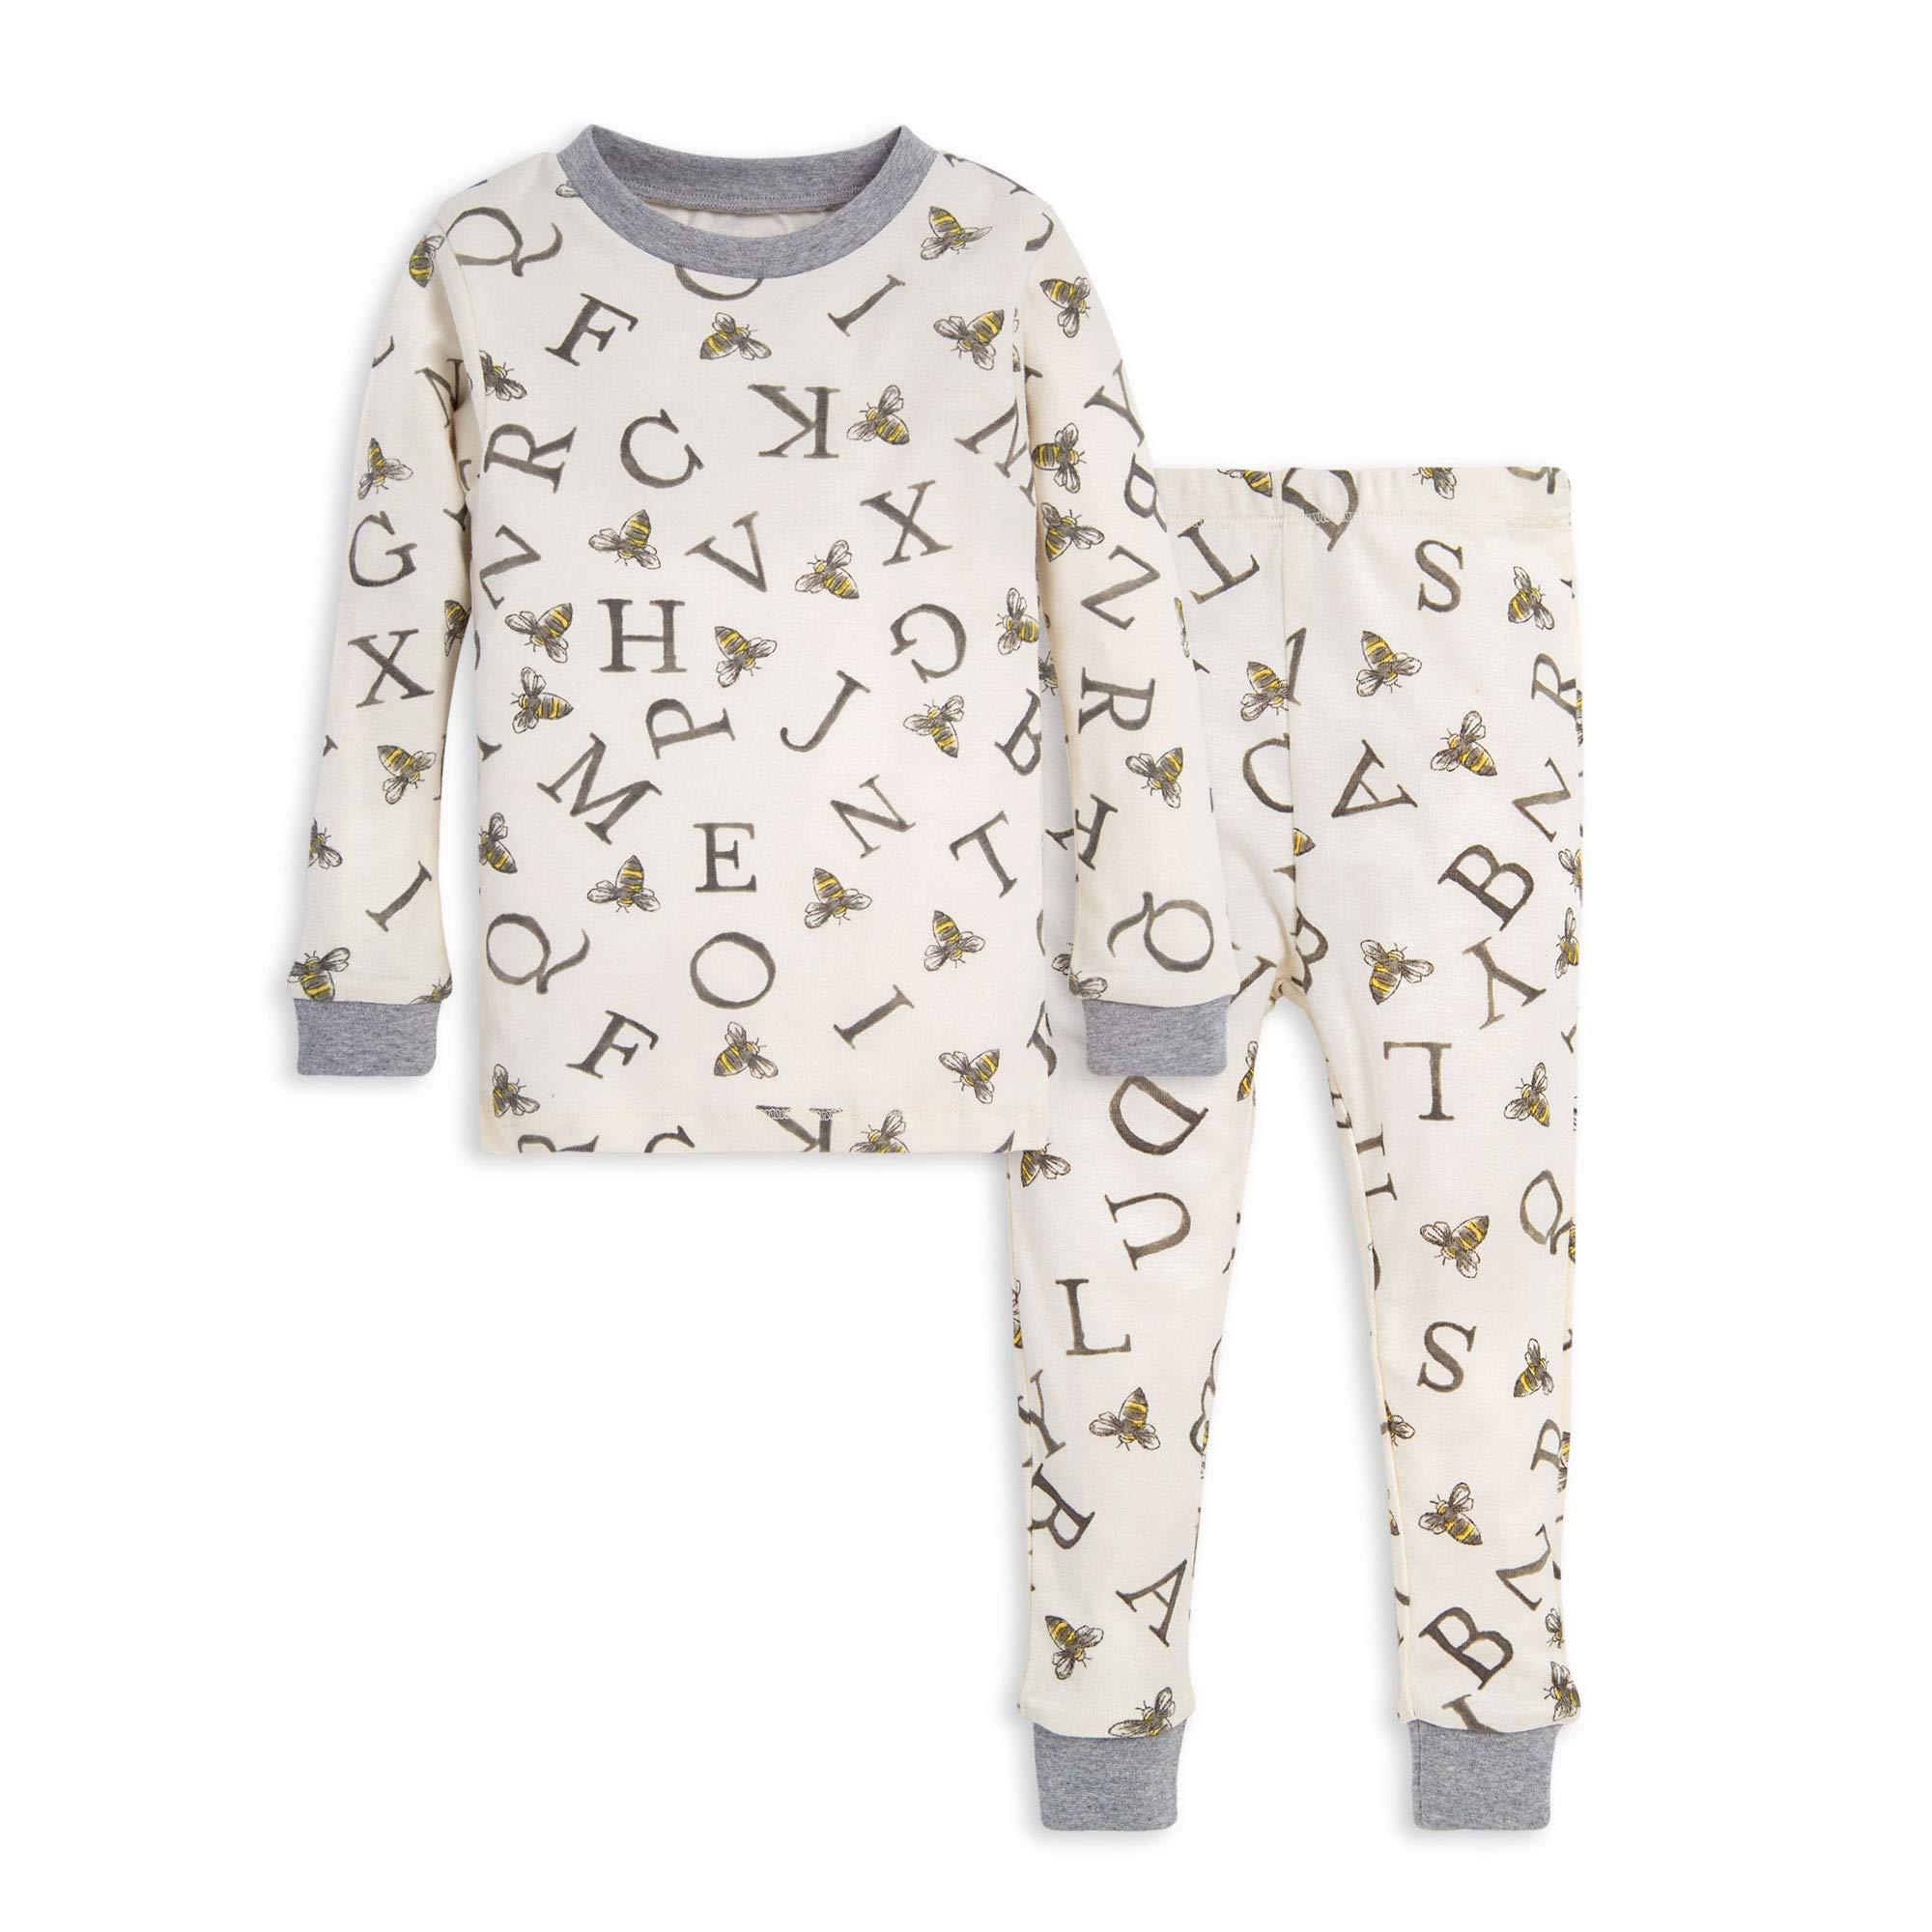 Burt's Bees Baby Baby Little Kids Pajamas, 2-Piece